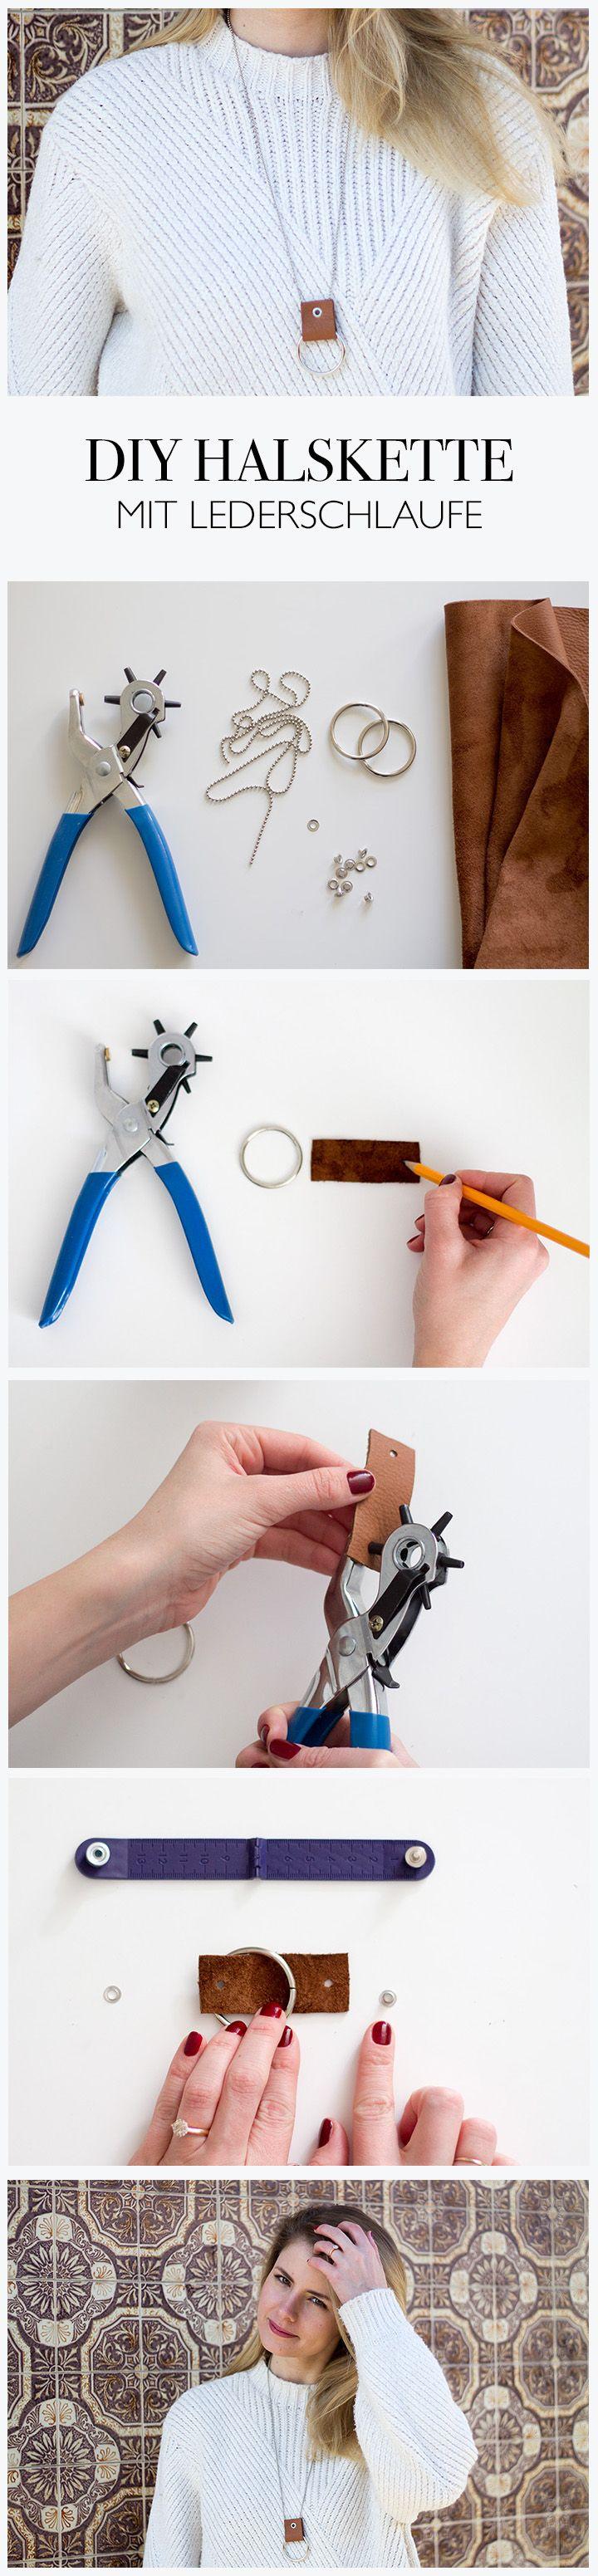 DIY Halskette mit Lederschlaufe selber machen - lindaloves.de DIY Blog aus Berlin